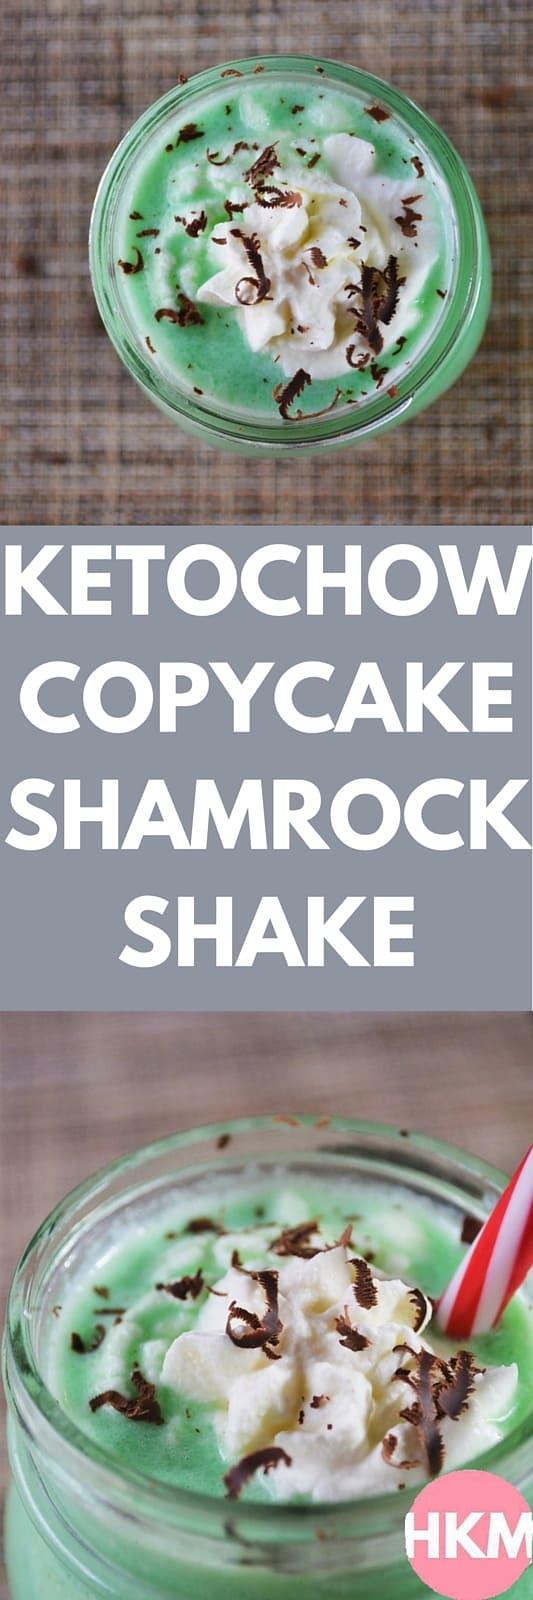 Keto Chow Copycat Shamrock Shake | heyketomama.com